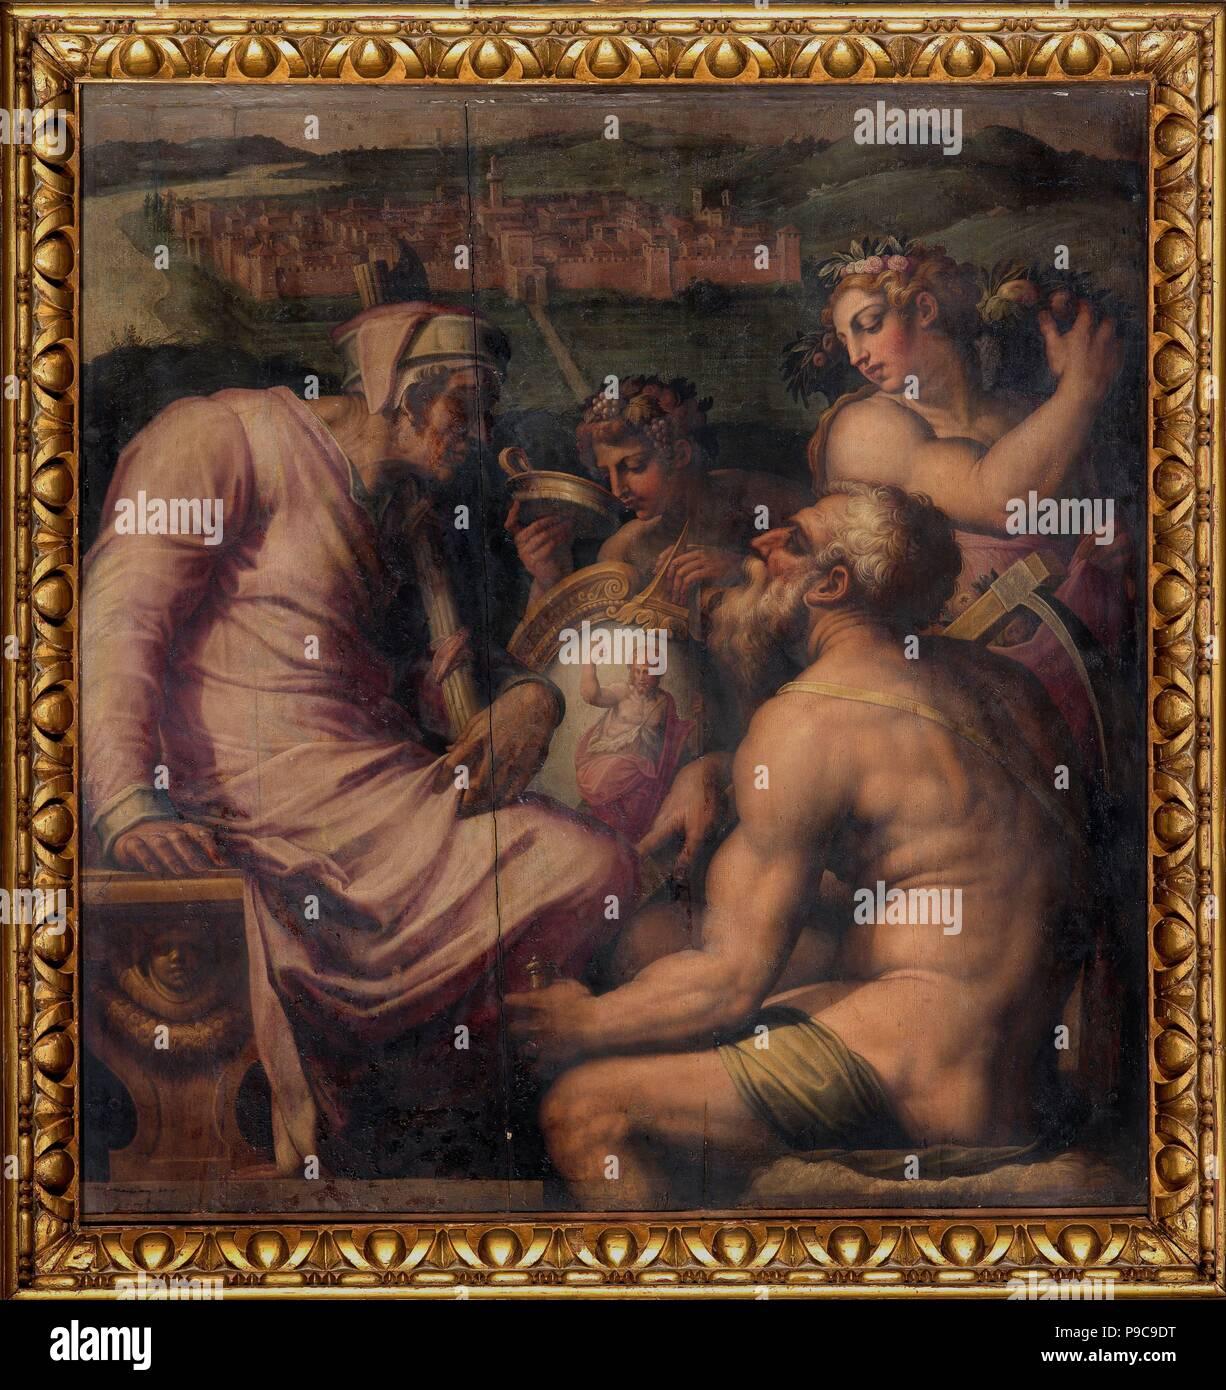 Allegory of San Giovanni Valdarno. Museum: Palazzo Vecchio, Florence. Stock Photo